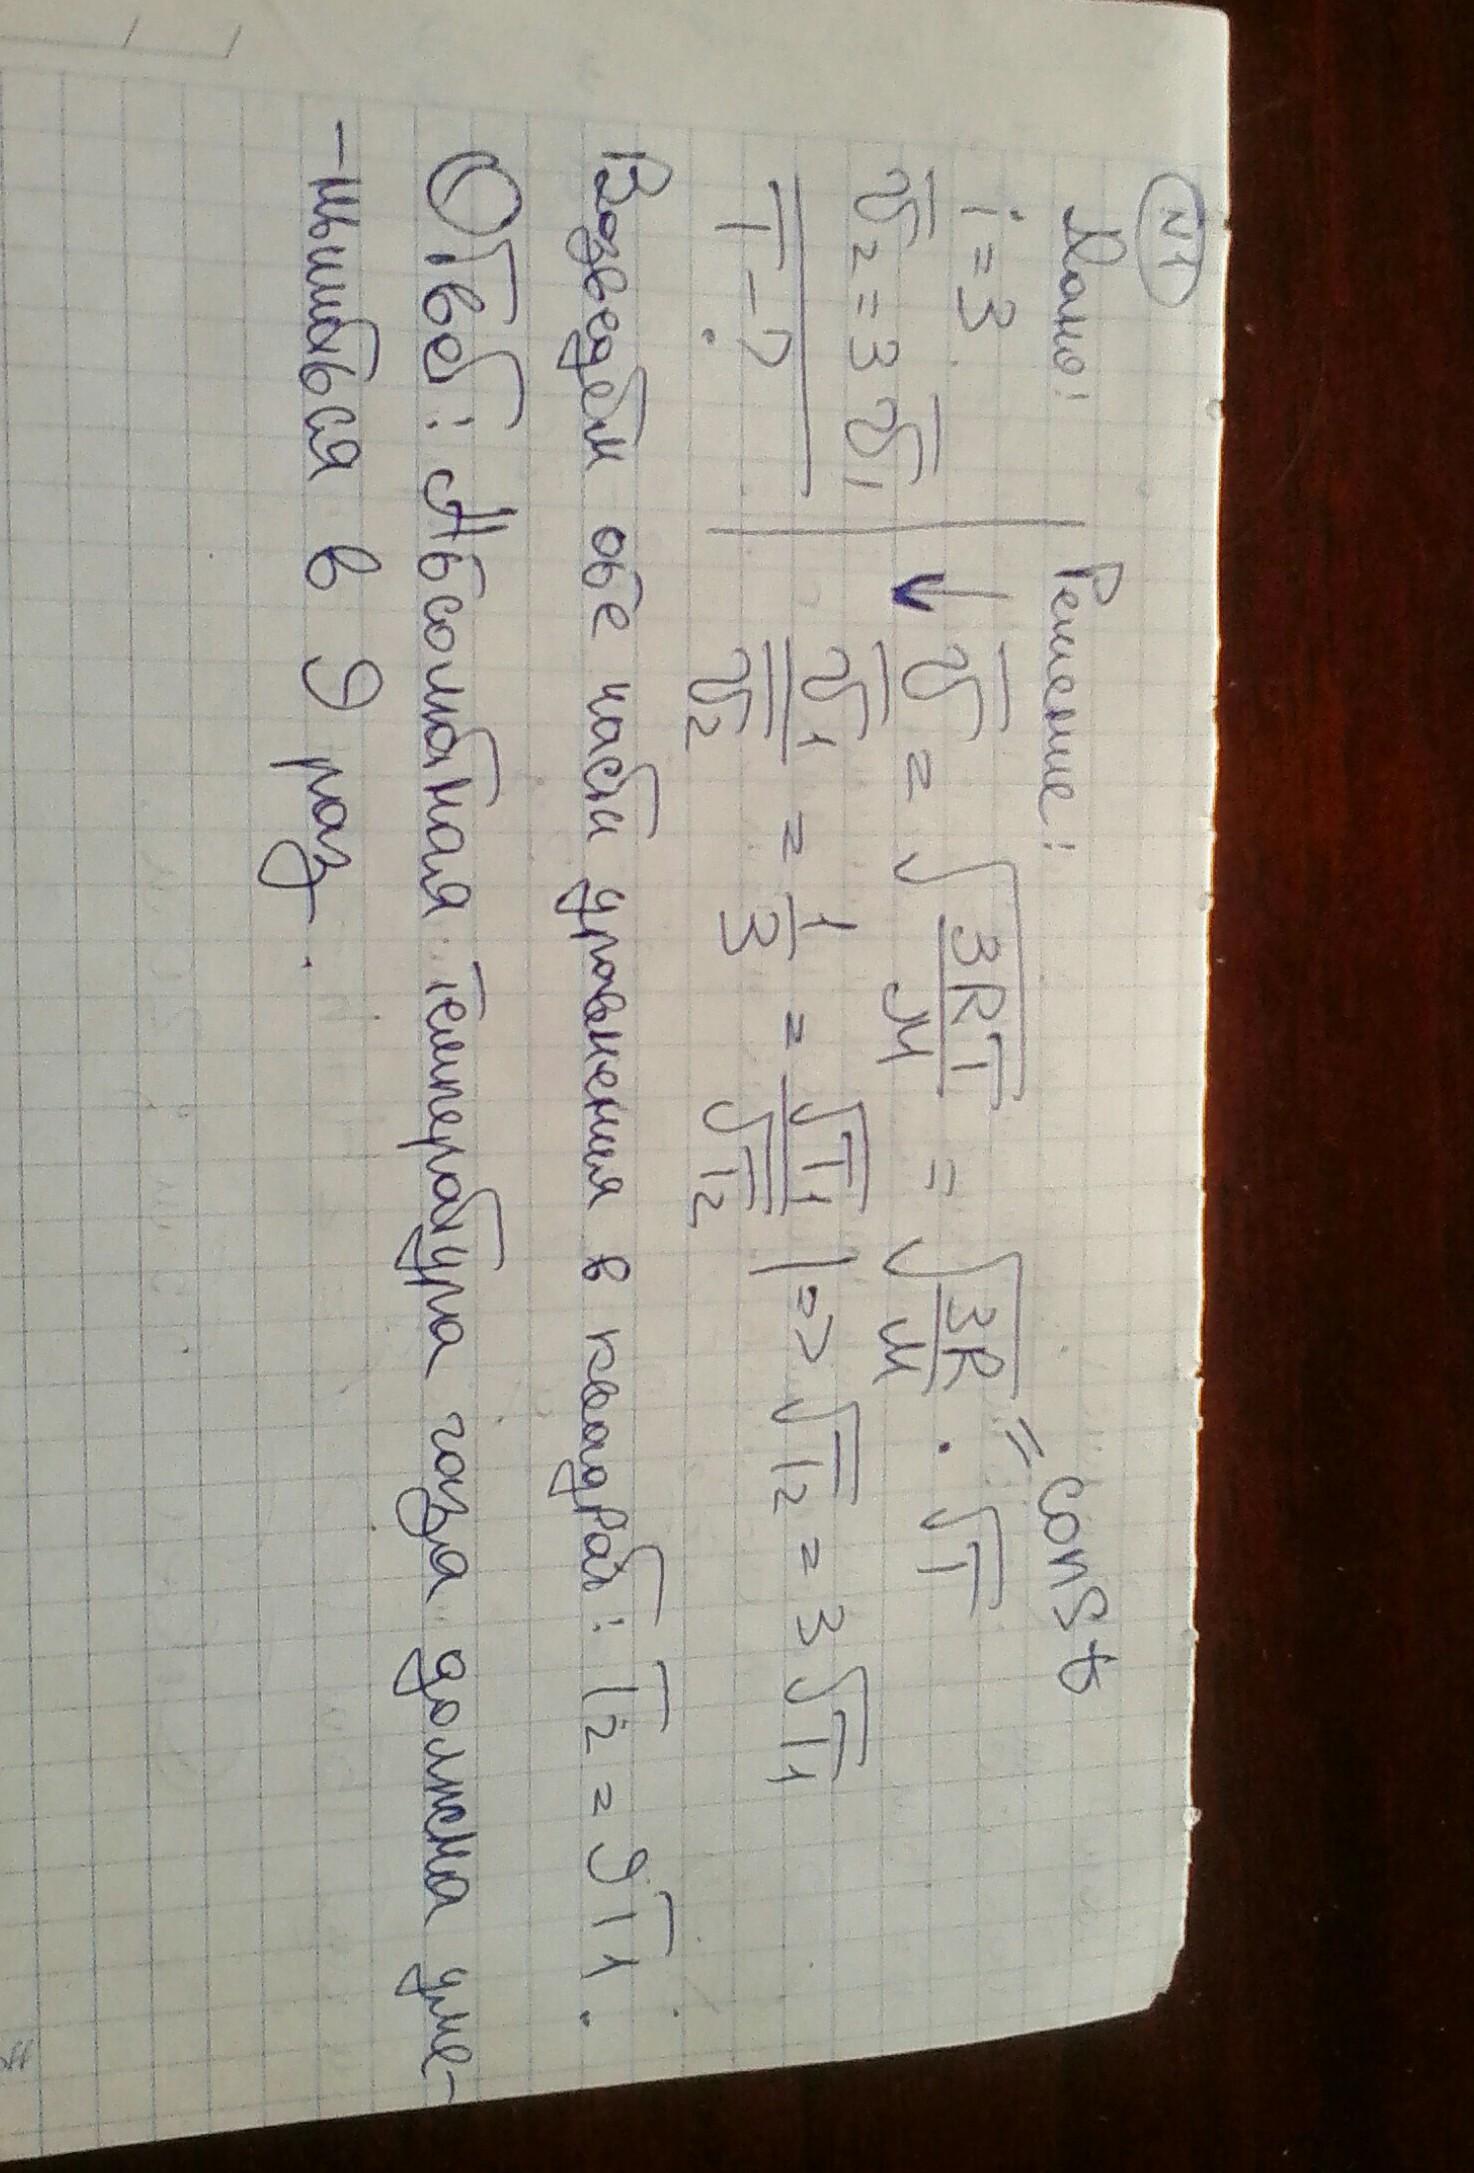 Помогите решить физику срочно 50балла